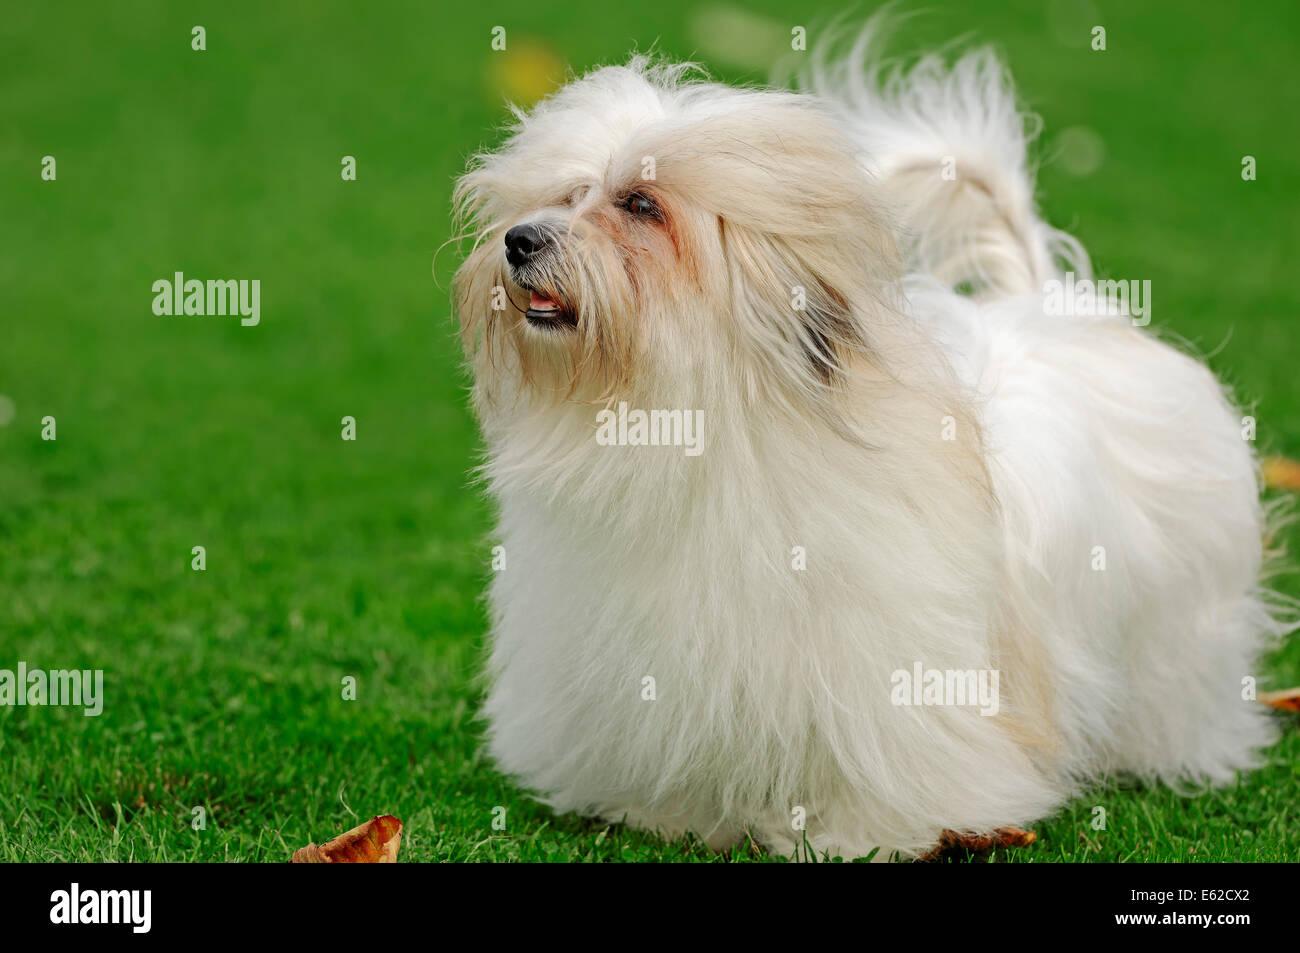 Coton de Tulear (Canis lupus familiaris) - Stock Image